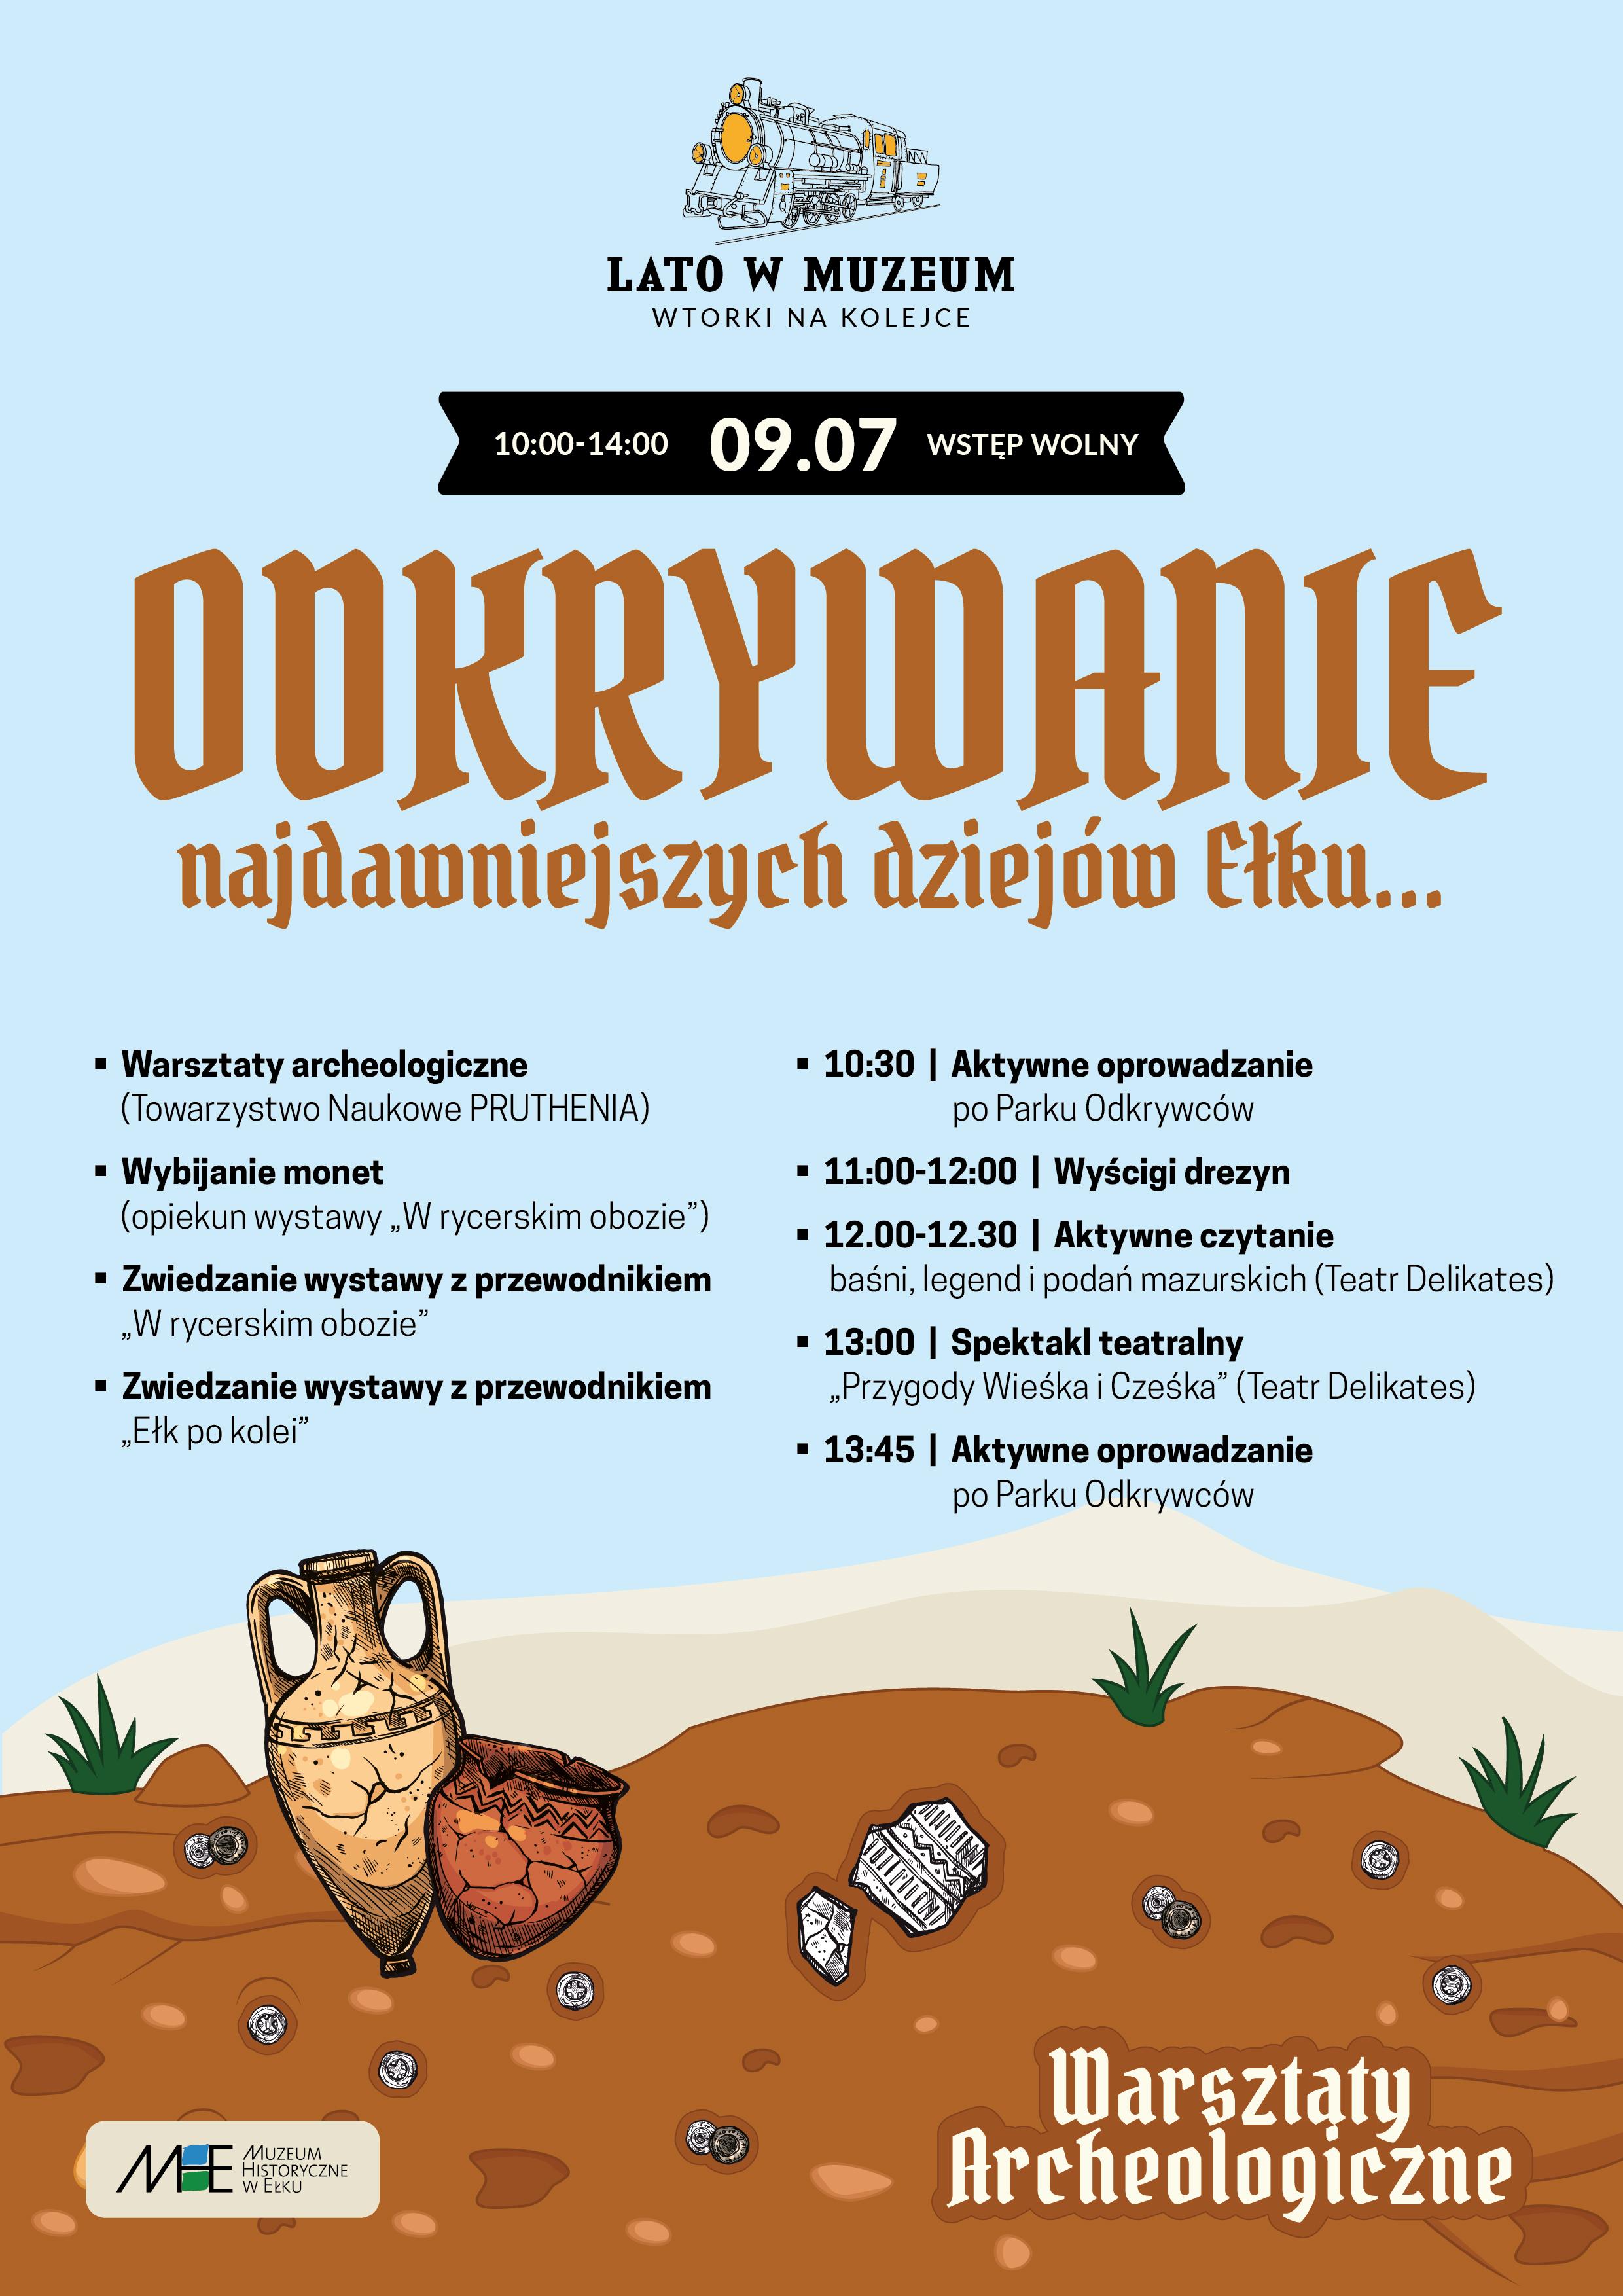 http://m.wm.pl/2019/07/orig/lato-w-muzeum-plakat-a2-01-562639.jpg